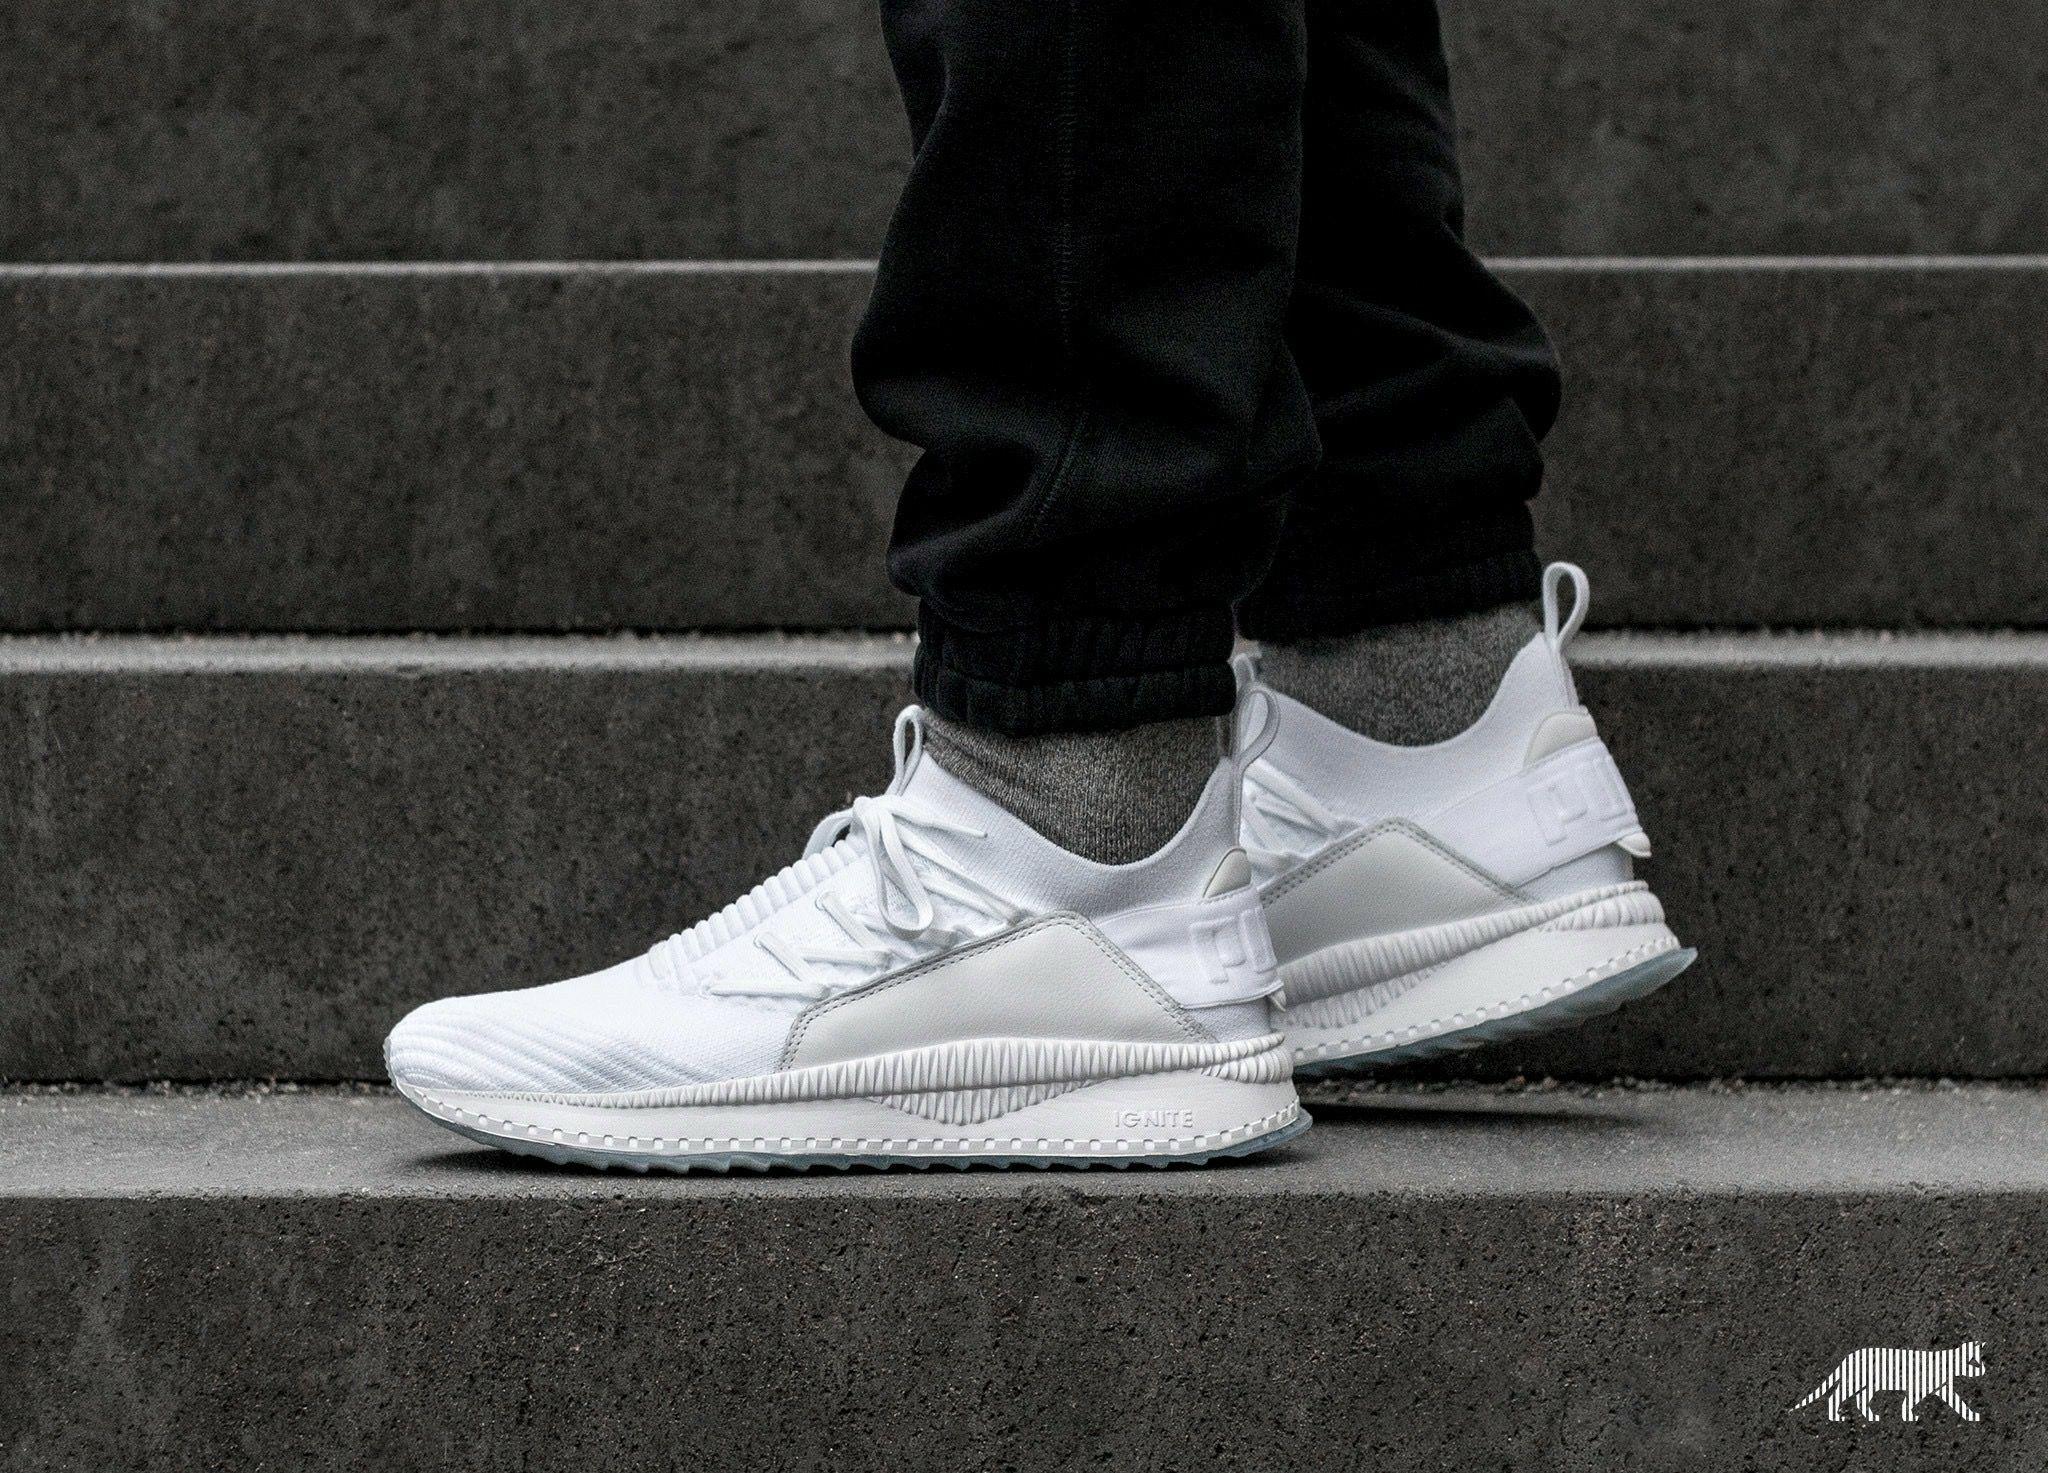 a4500cd890 Puma Tsugi Jun | shoe prototype | Adidas sneakers, Shoes, Adidas